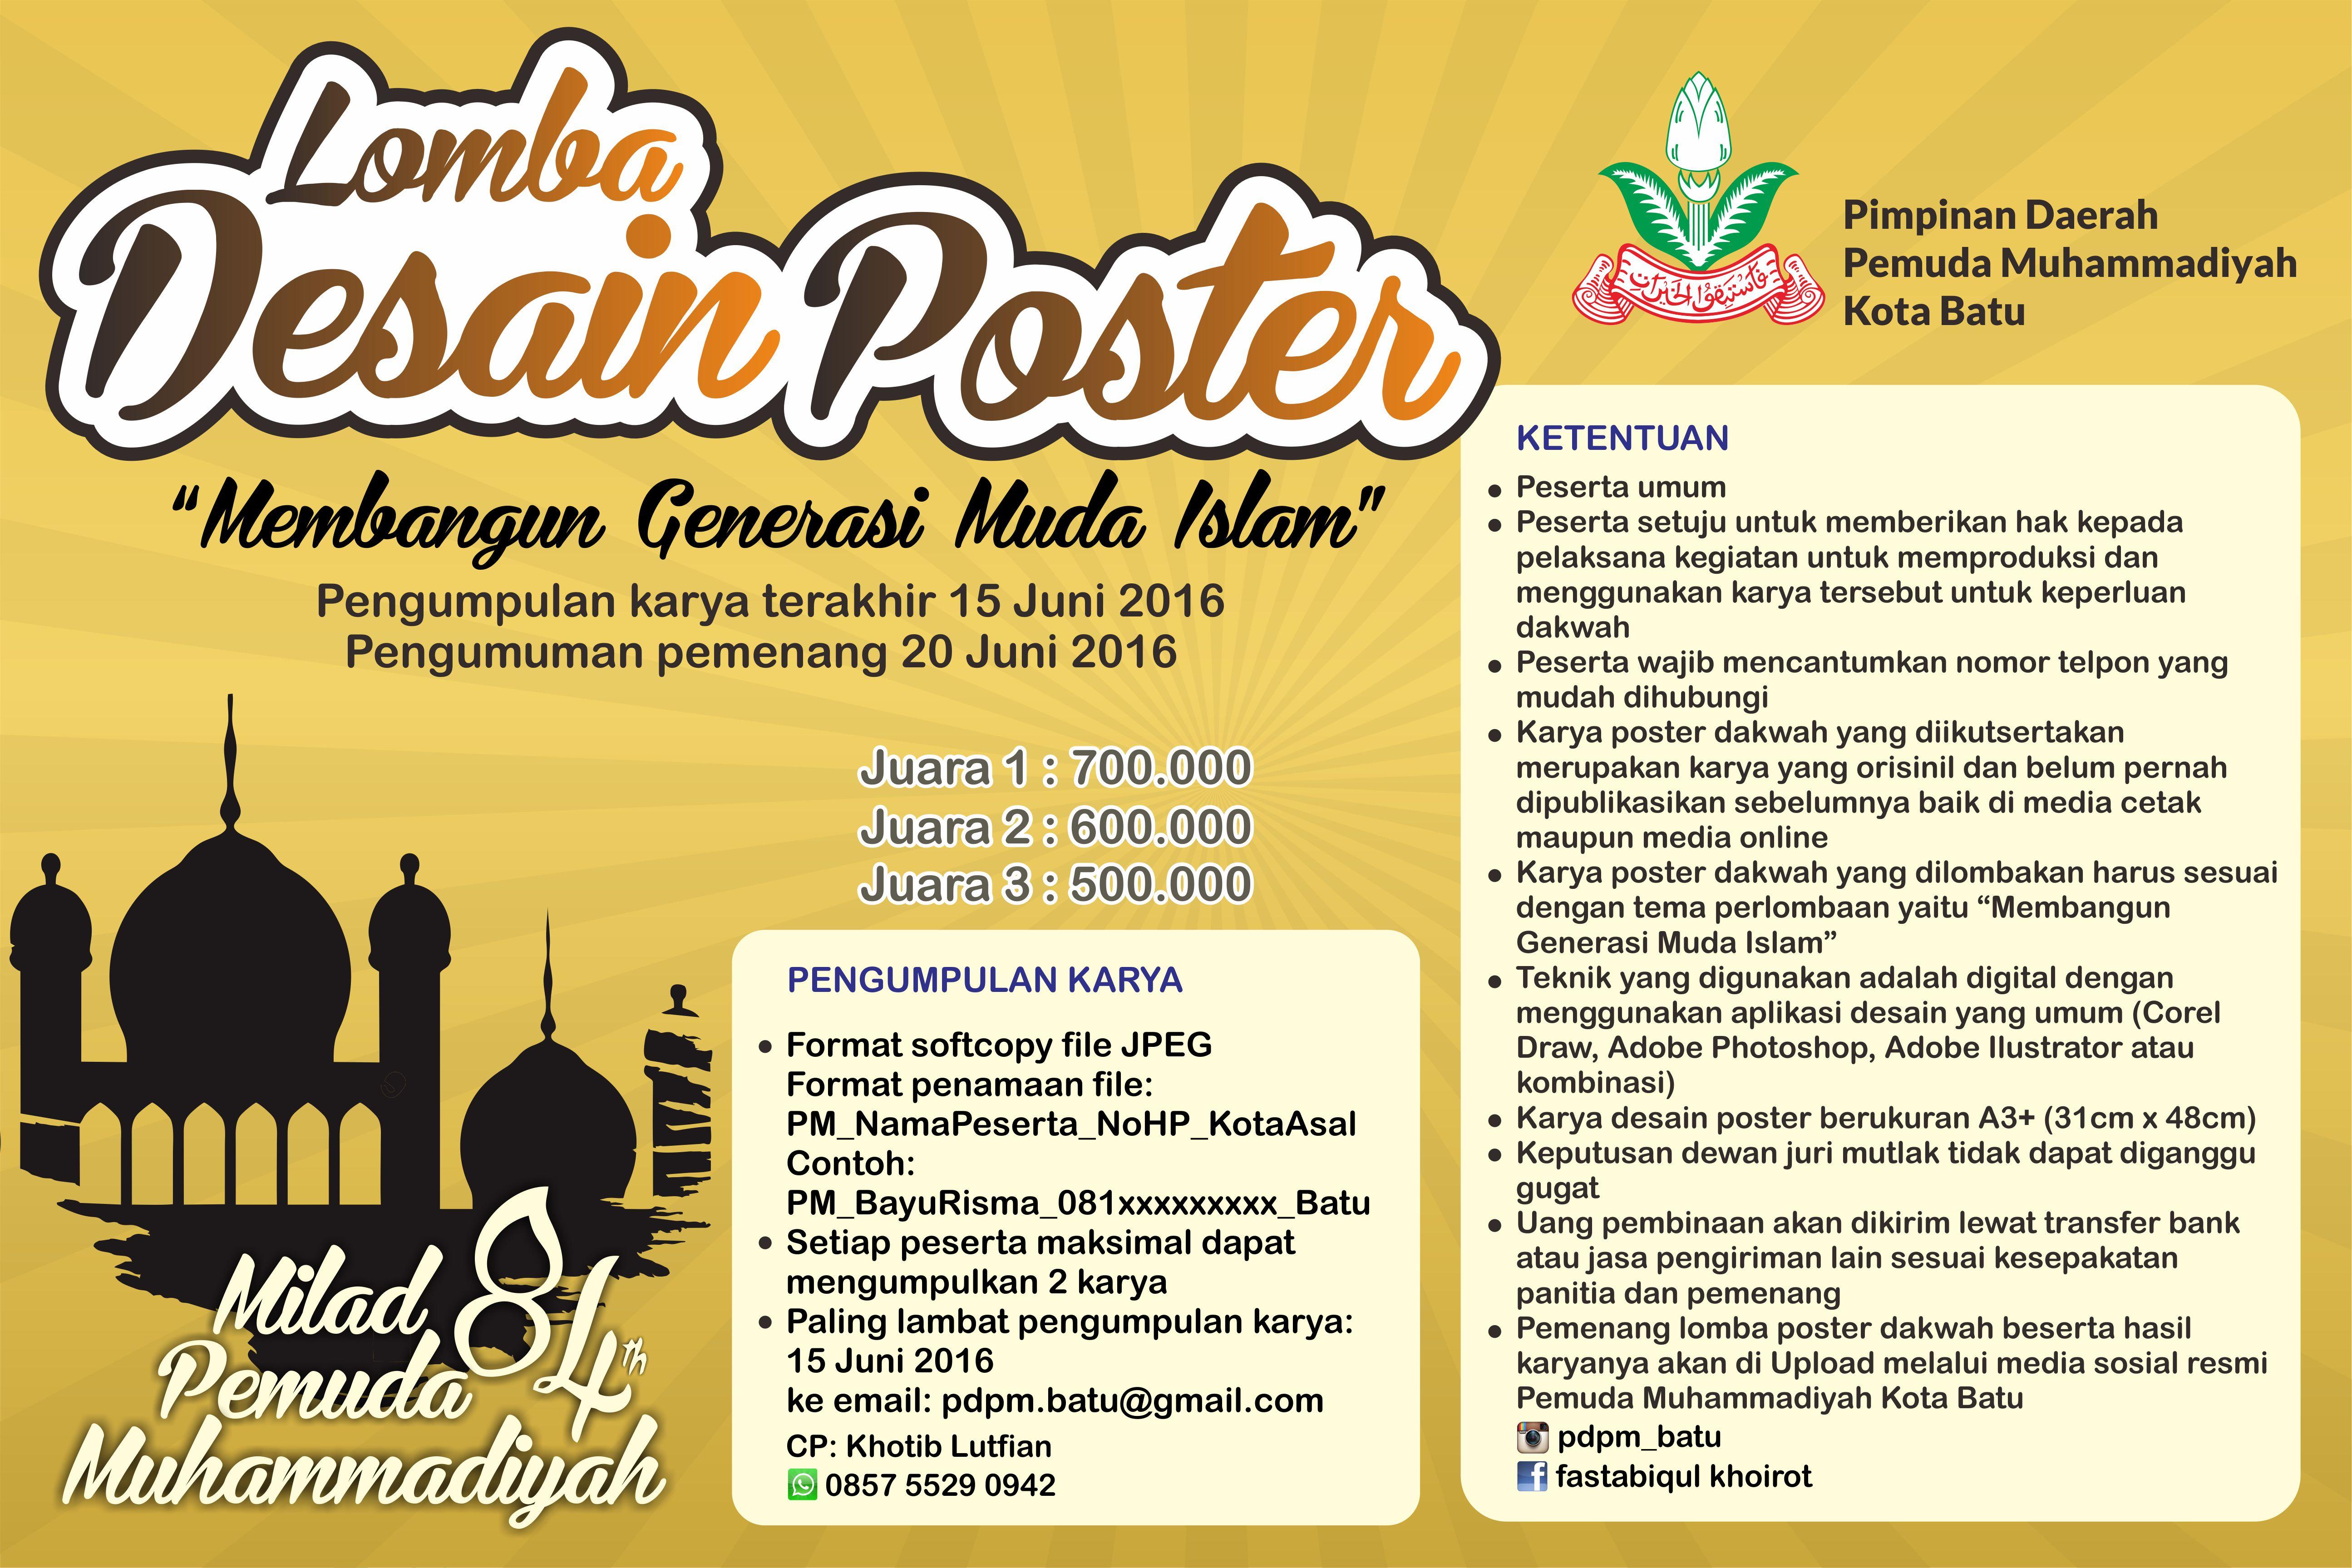 Poster Media Online